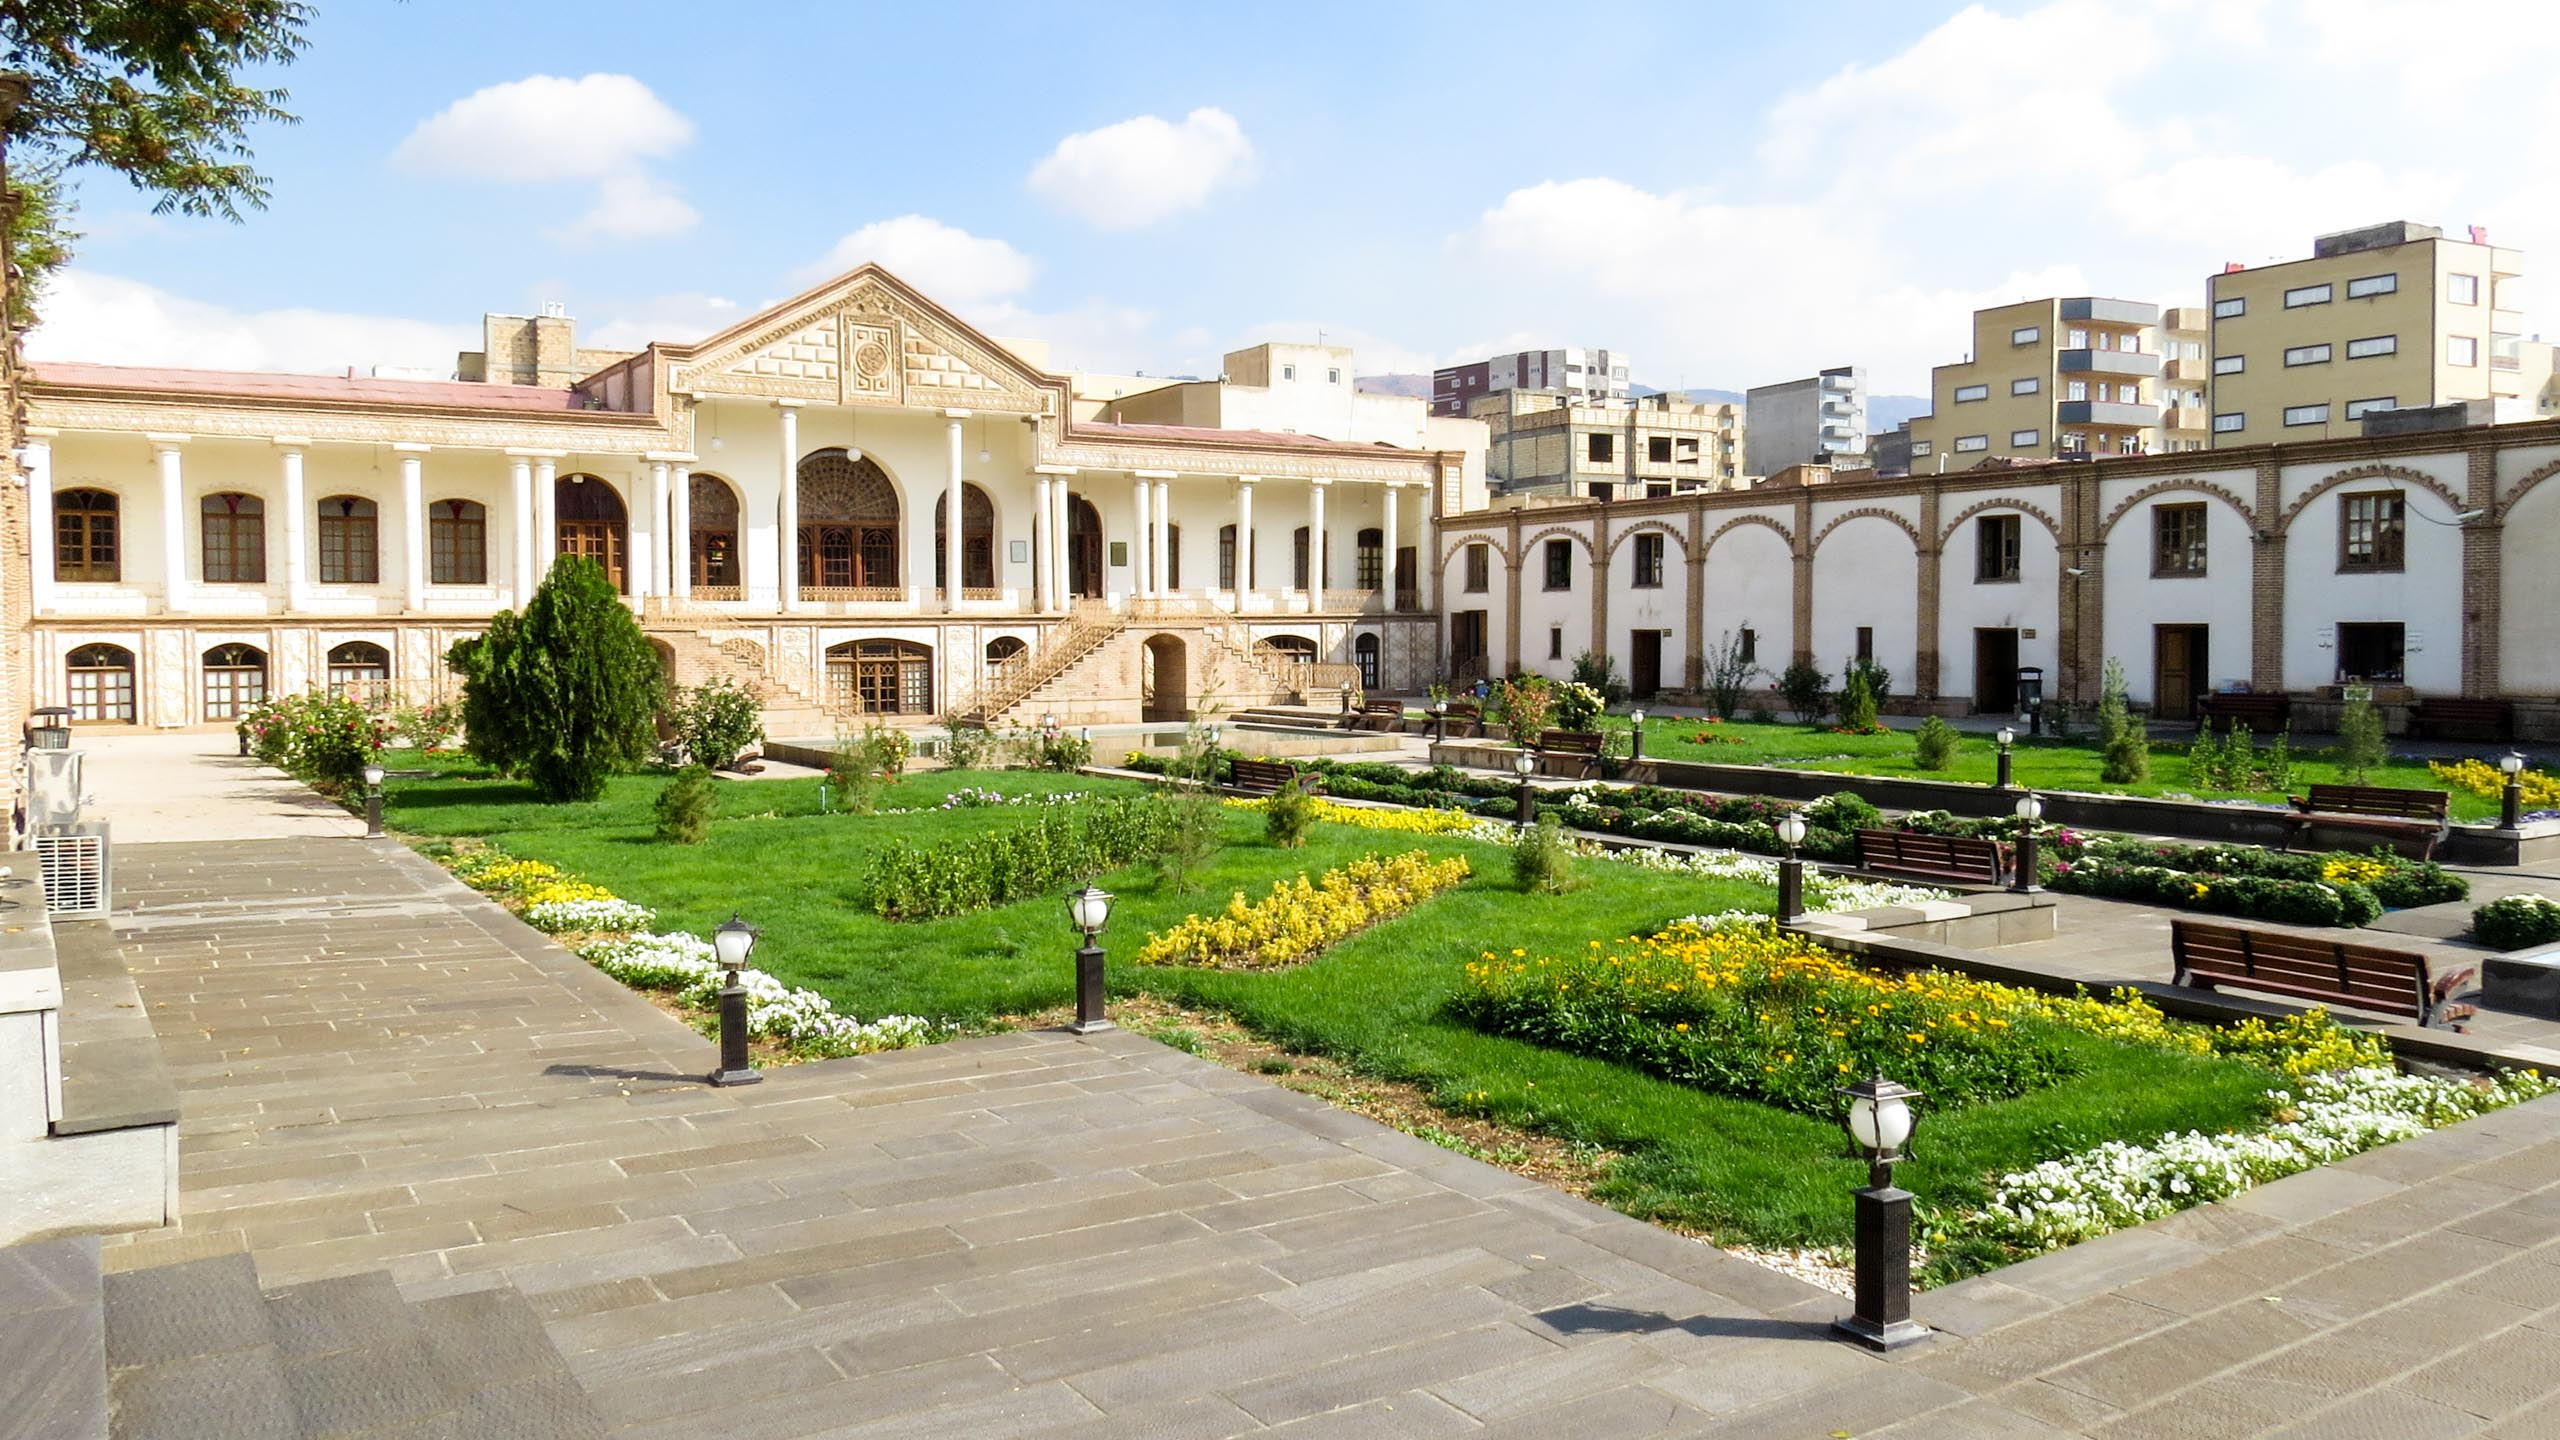 Courtyard garden of Iran building